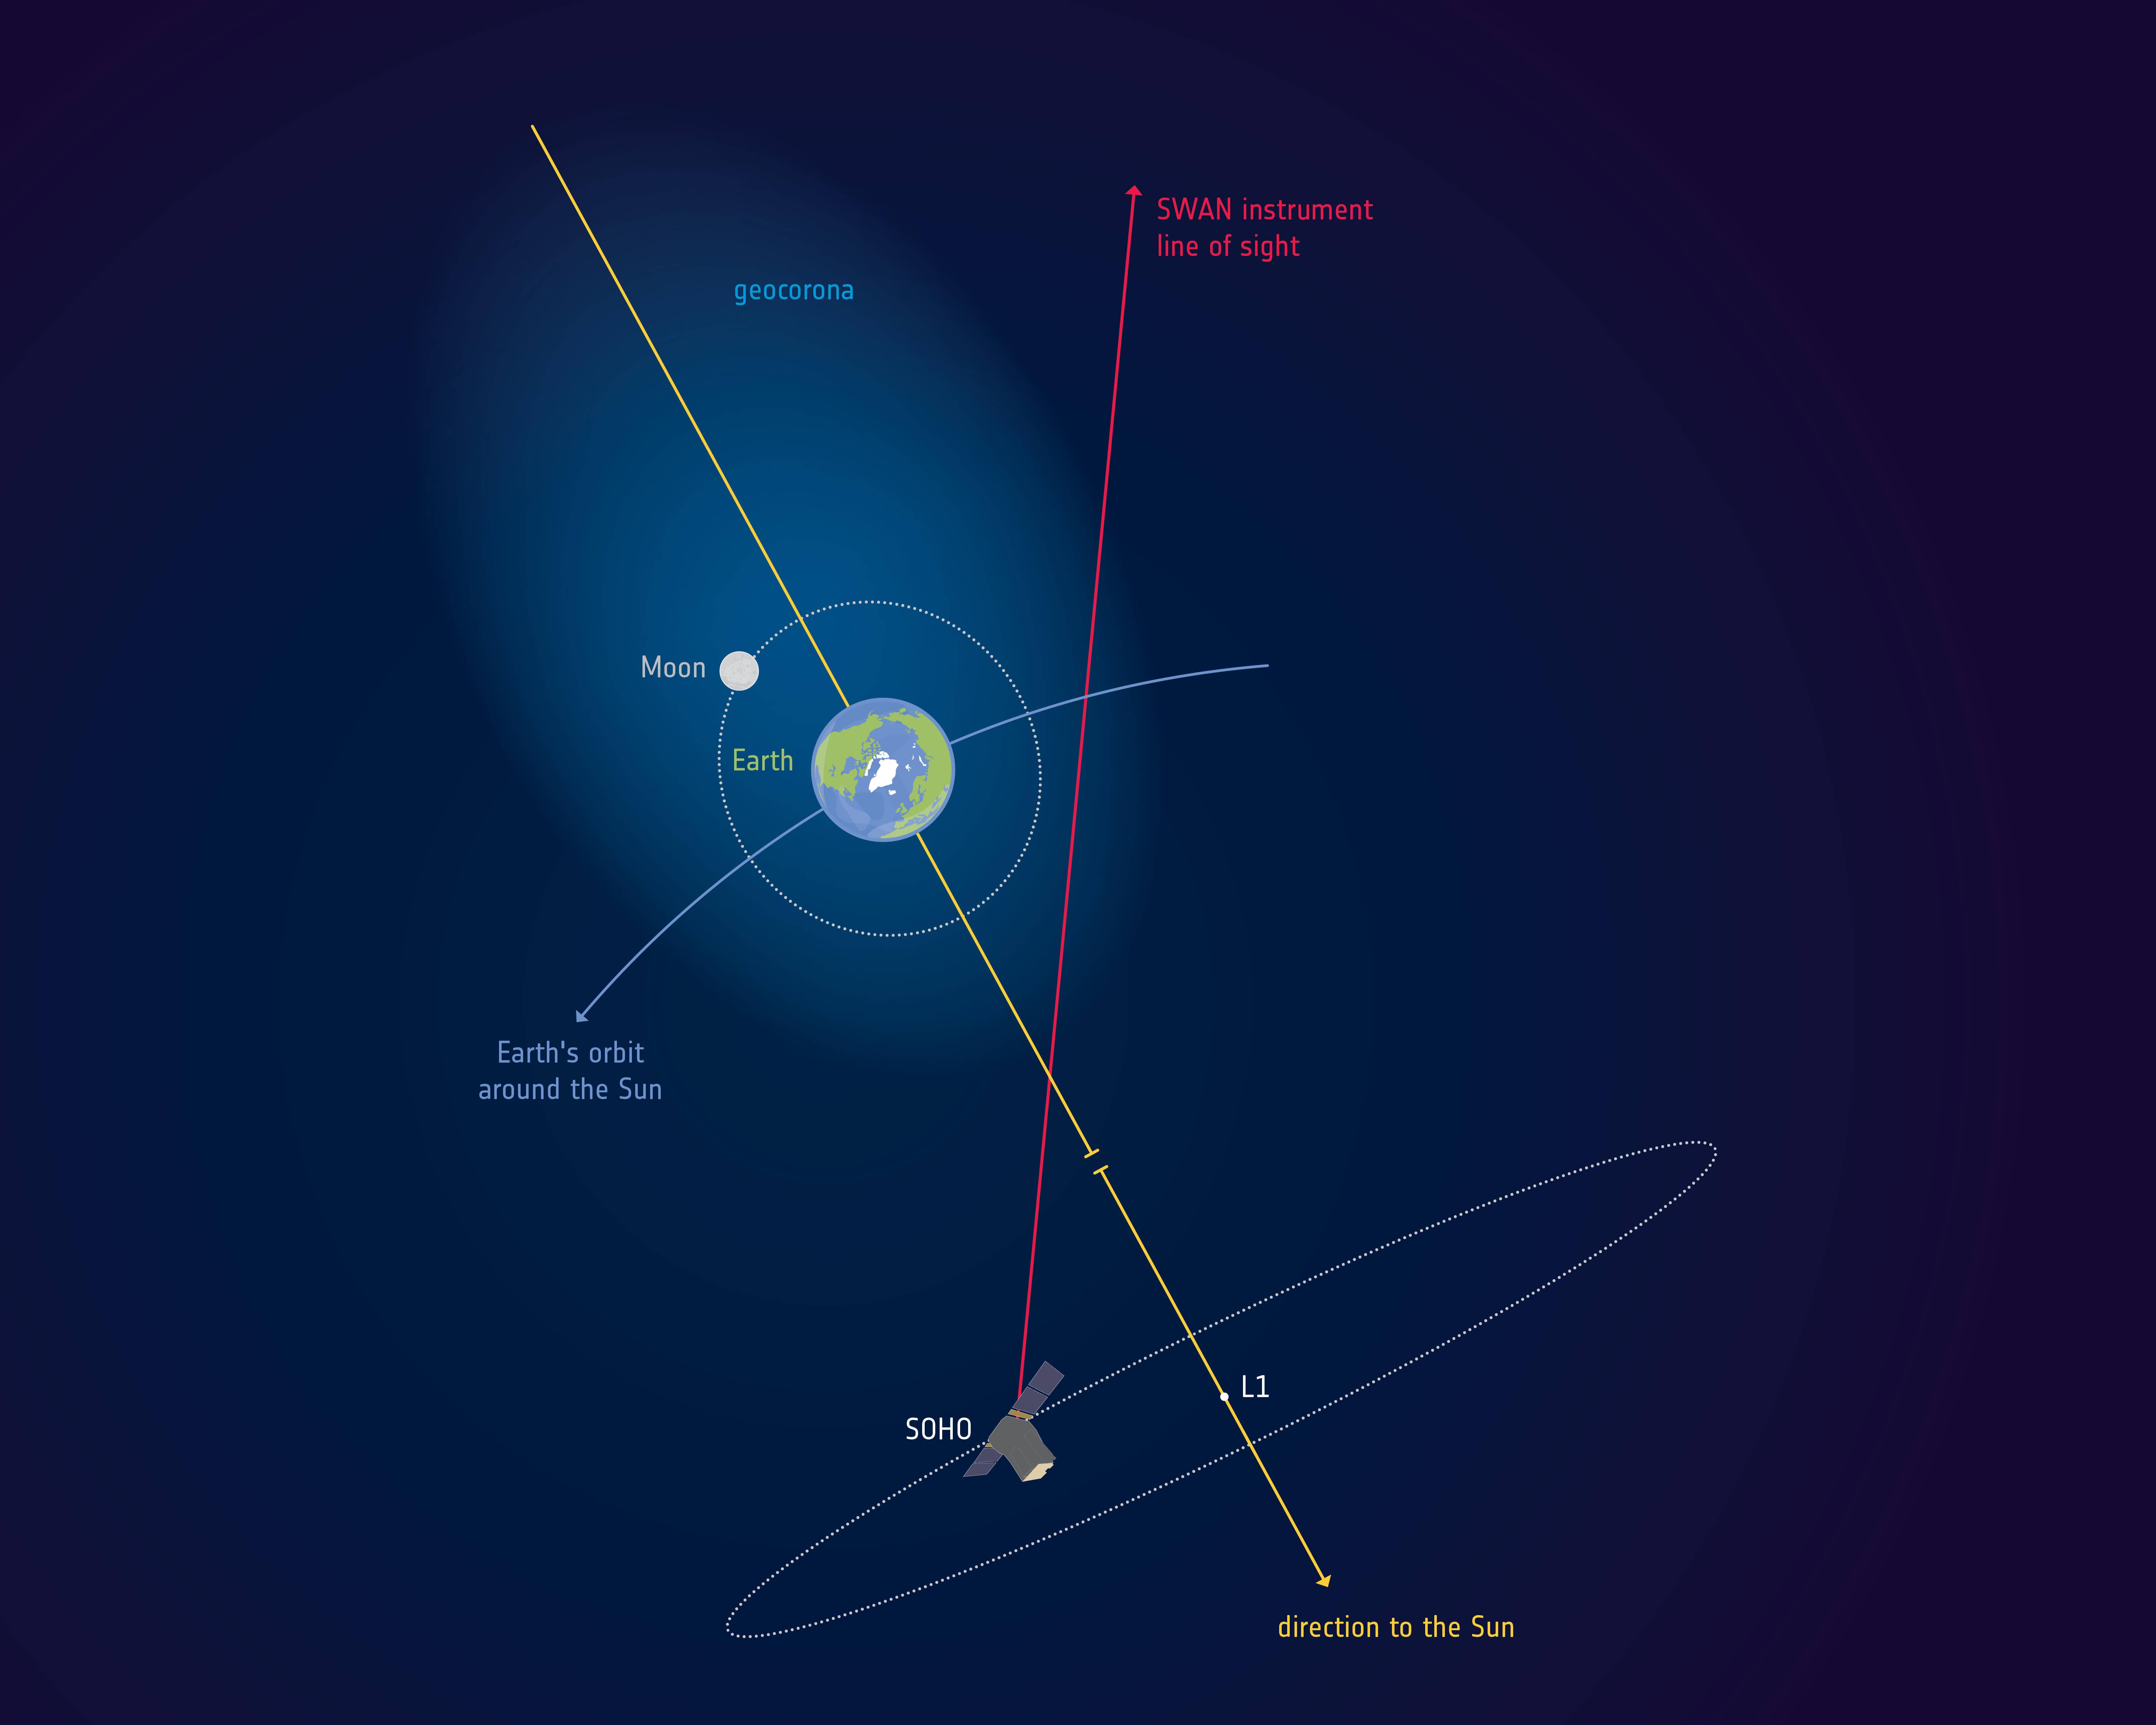 To infinity and beyond! Δεν φαντάζεστε μέχρι που φτάνει η ατμόσφαιρα της Γης